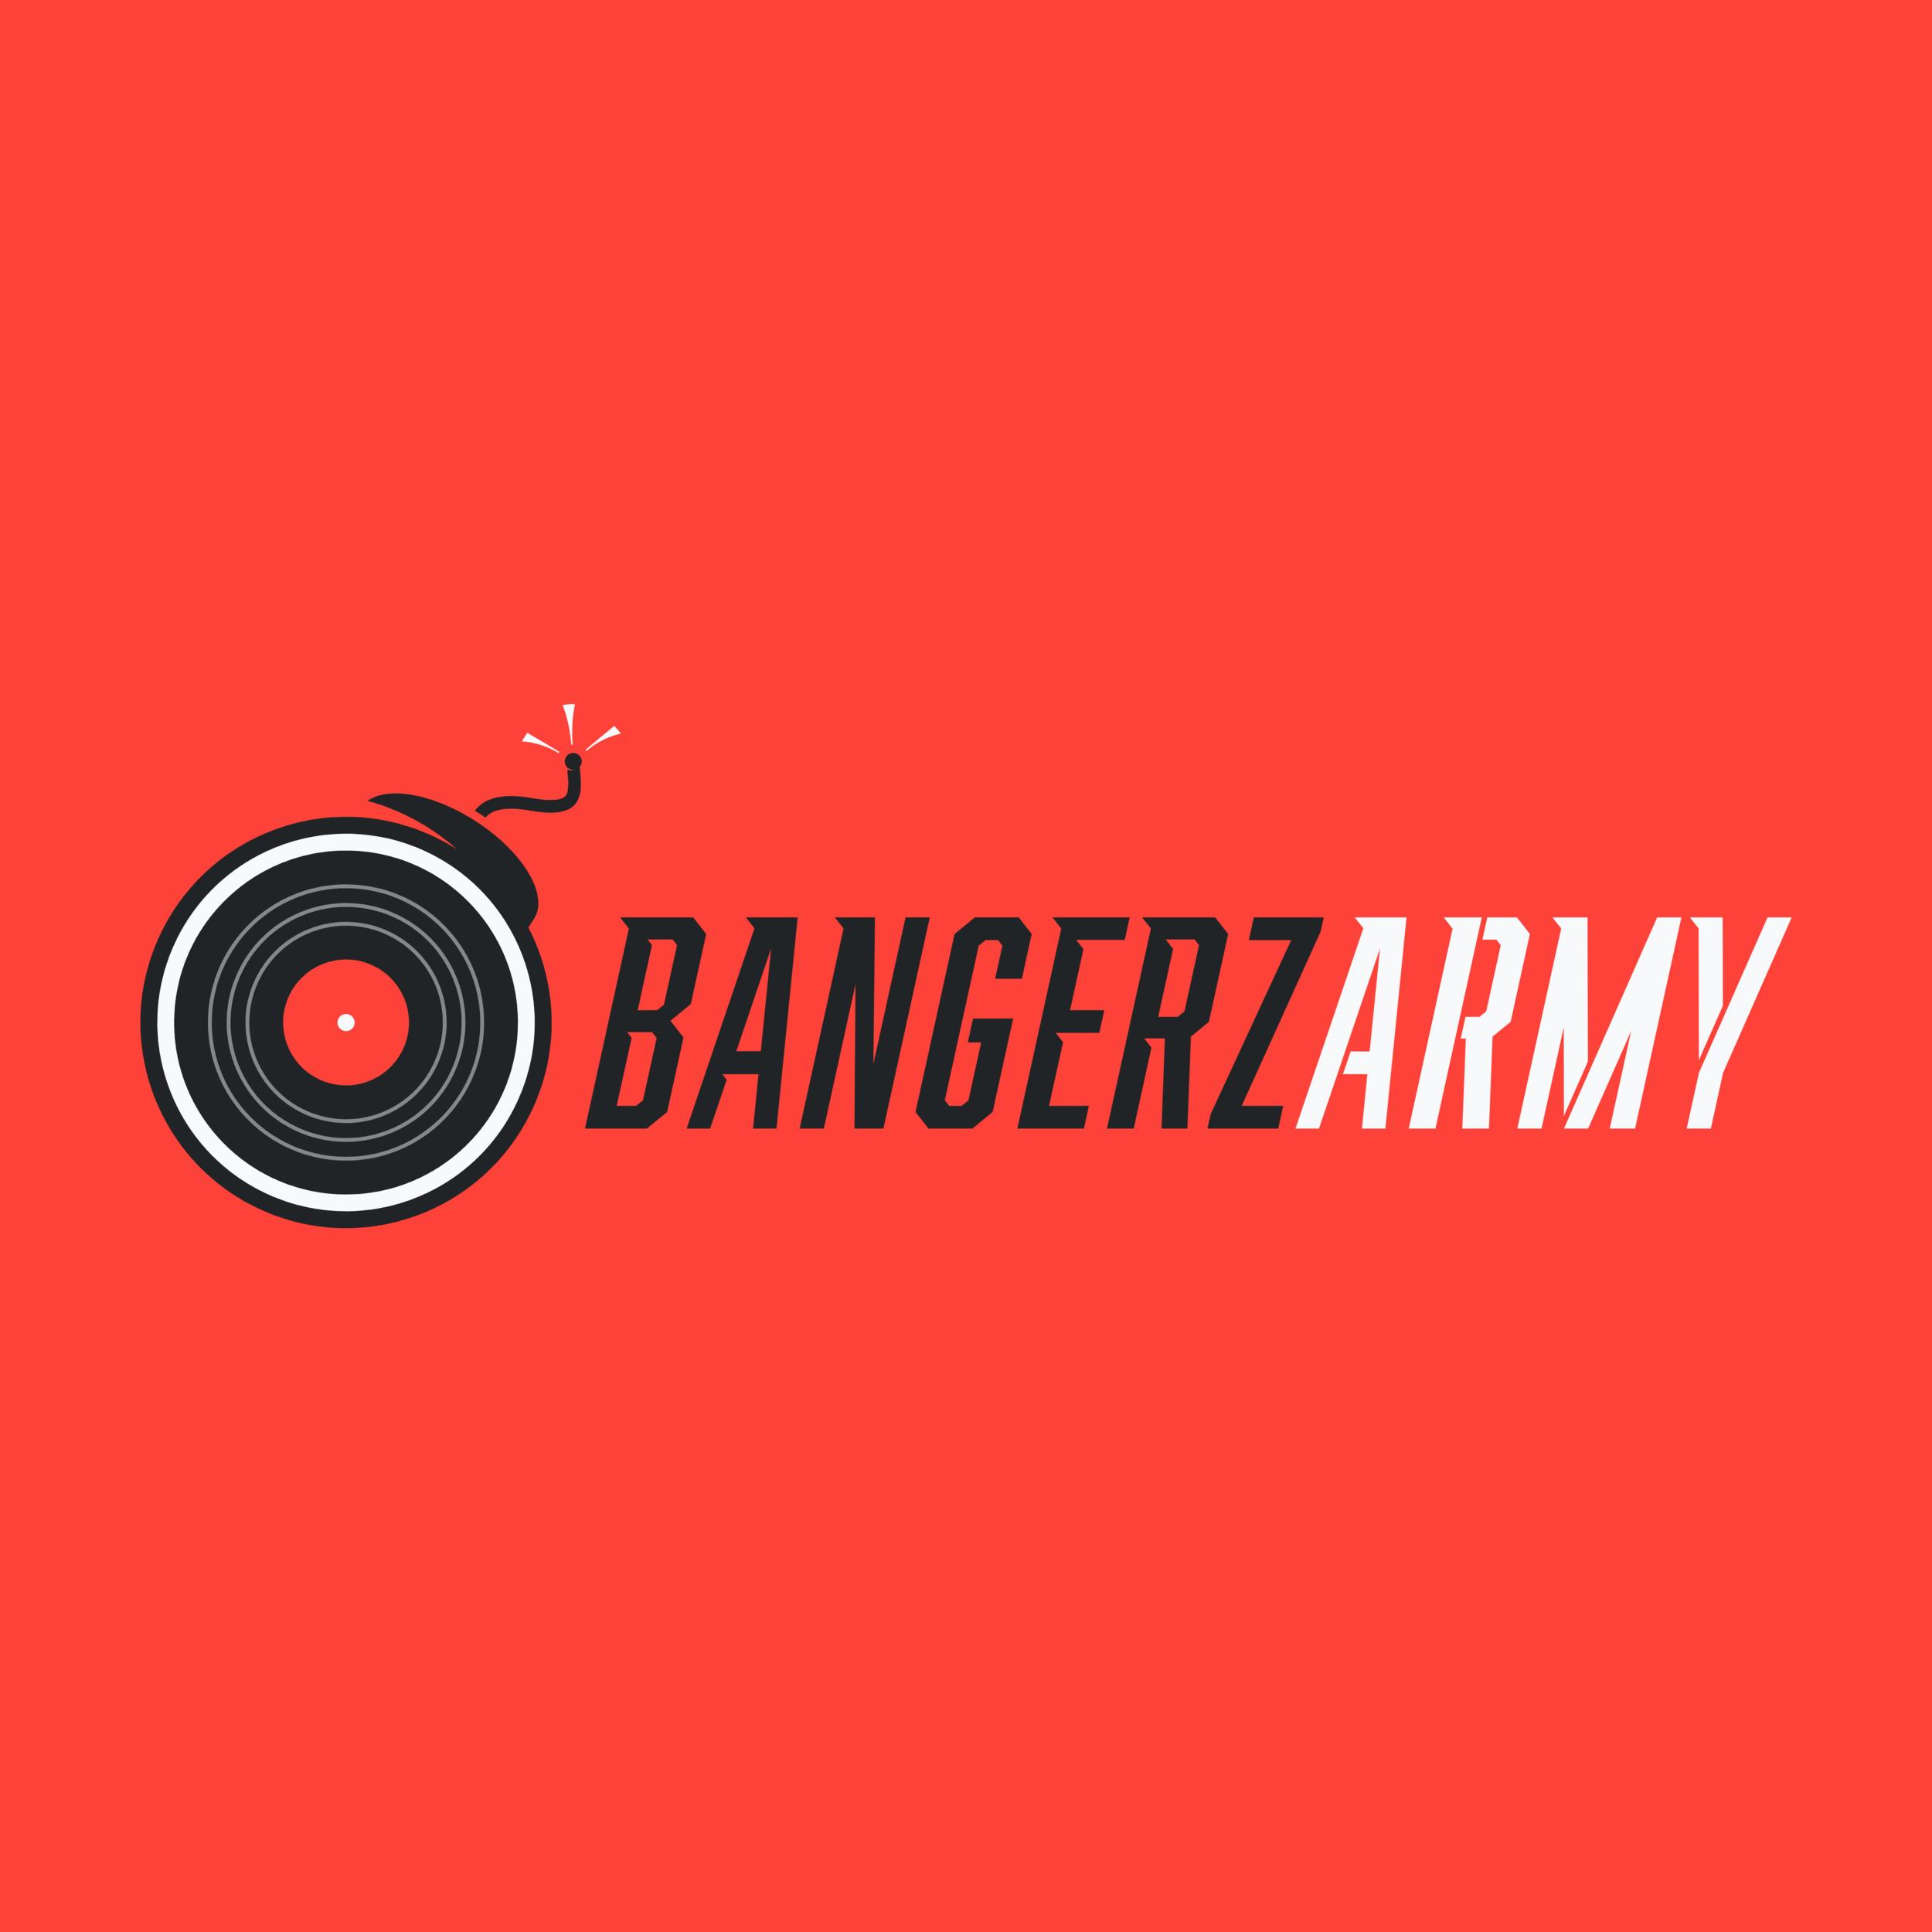 Bangerz Army - Combination MarkDJ Record Poollaunching 2019